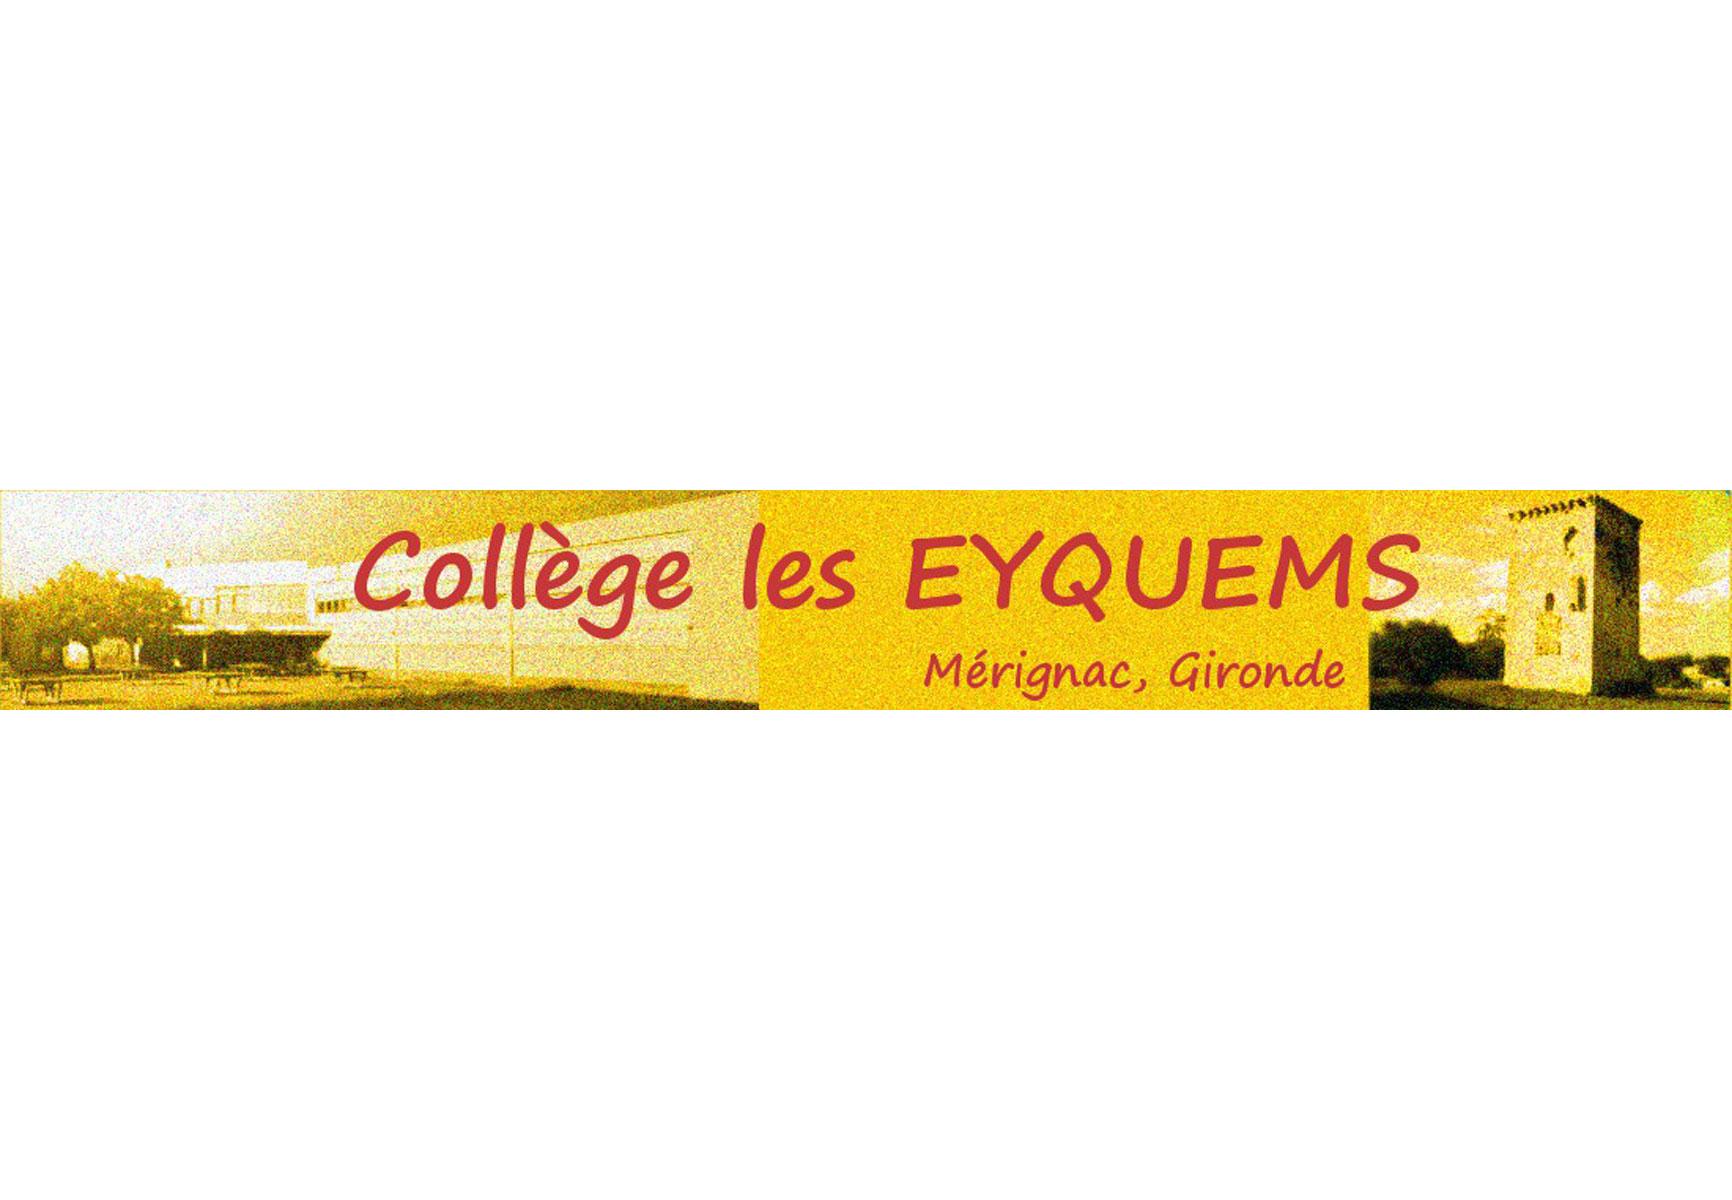 Collège Les Eyquems